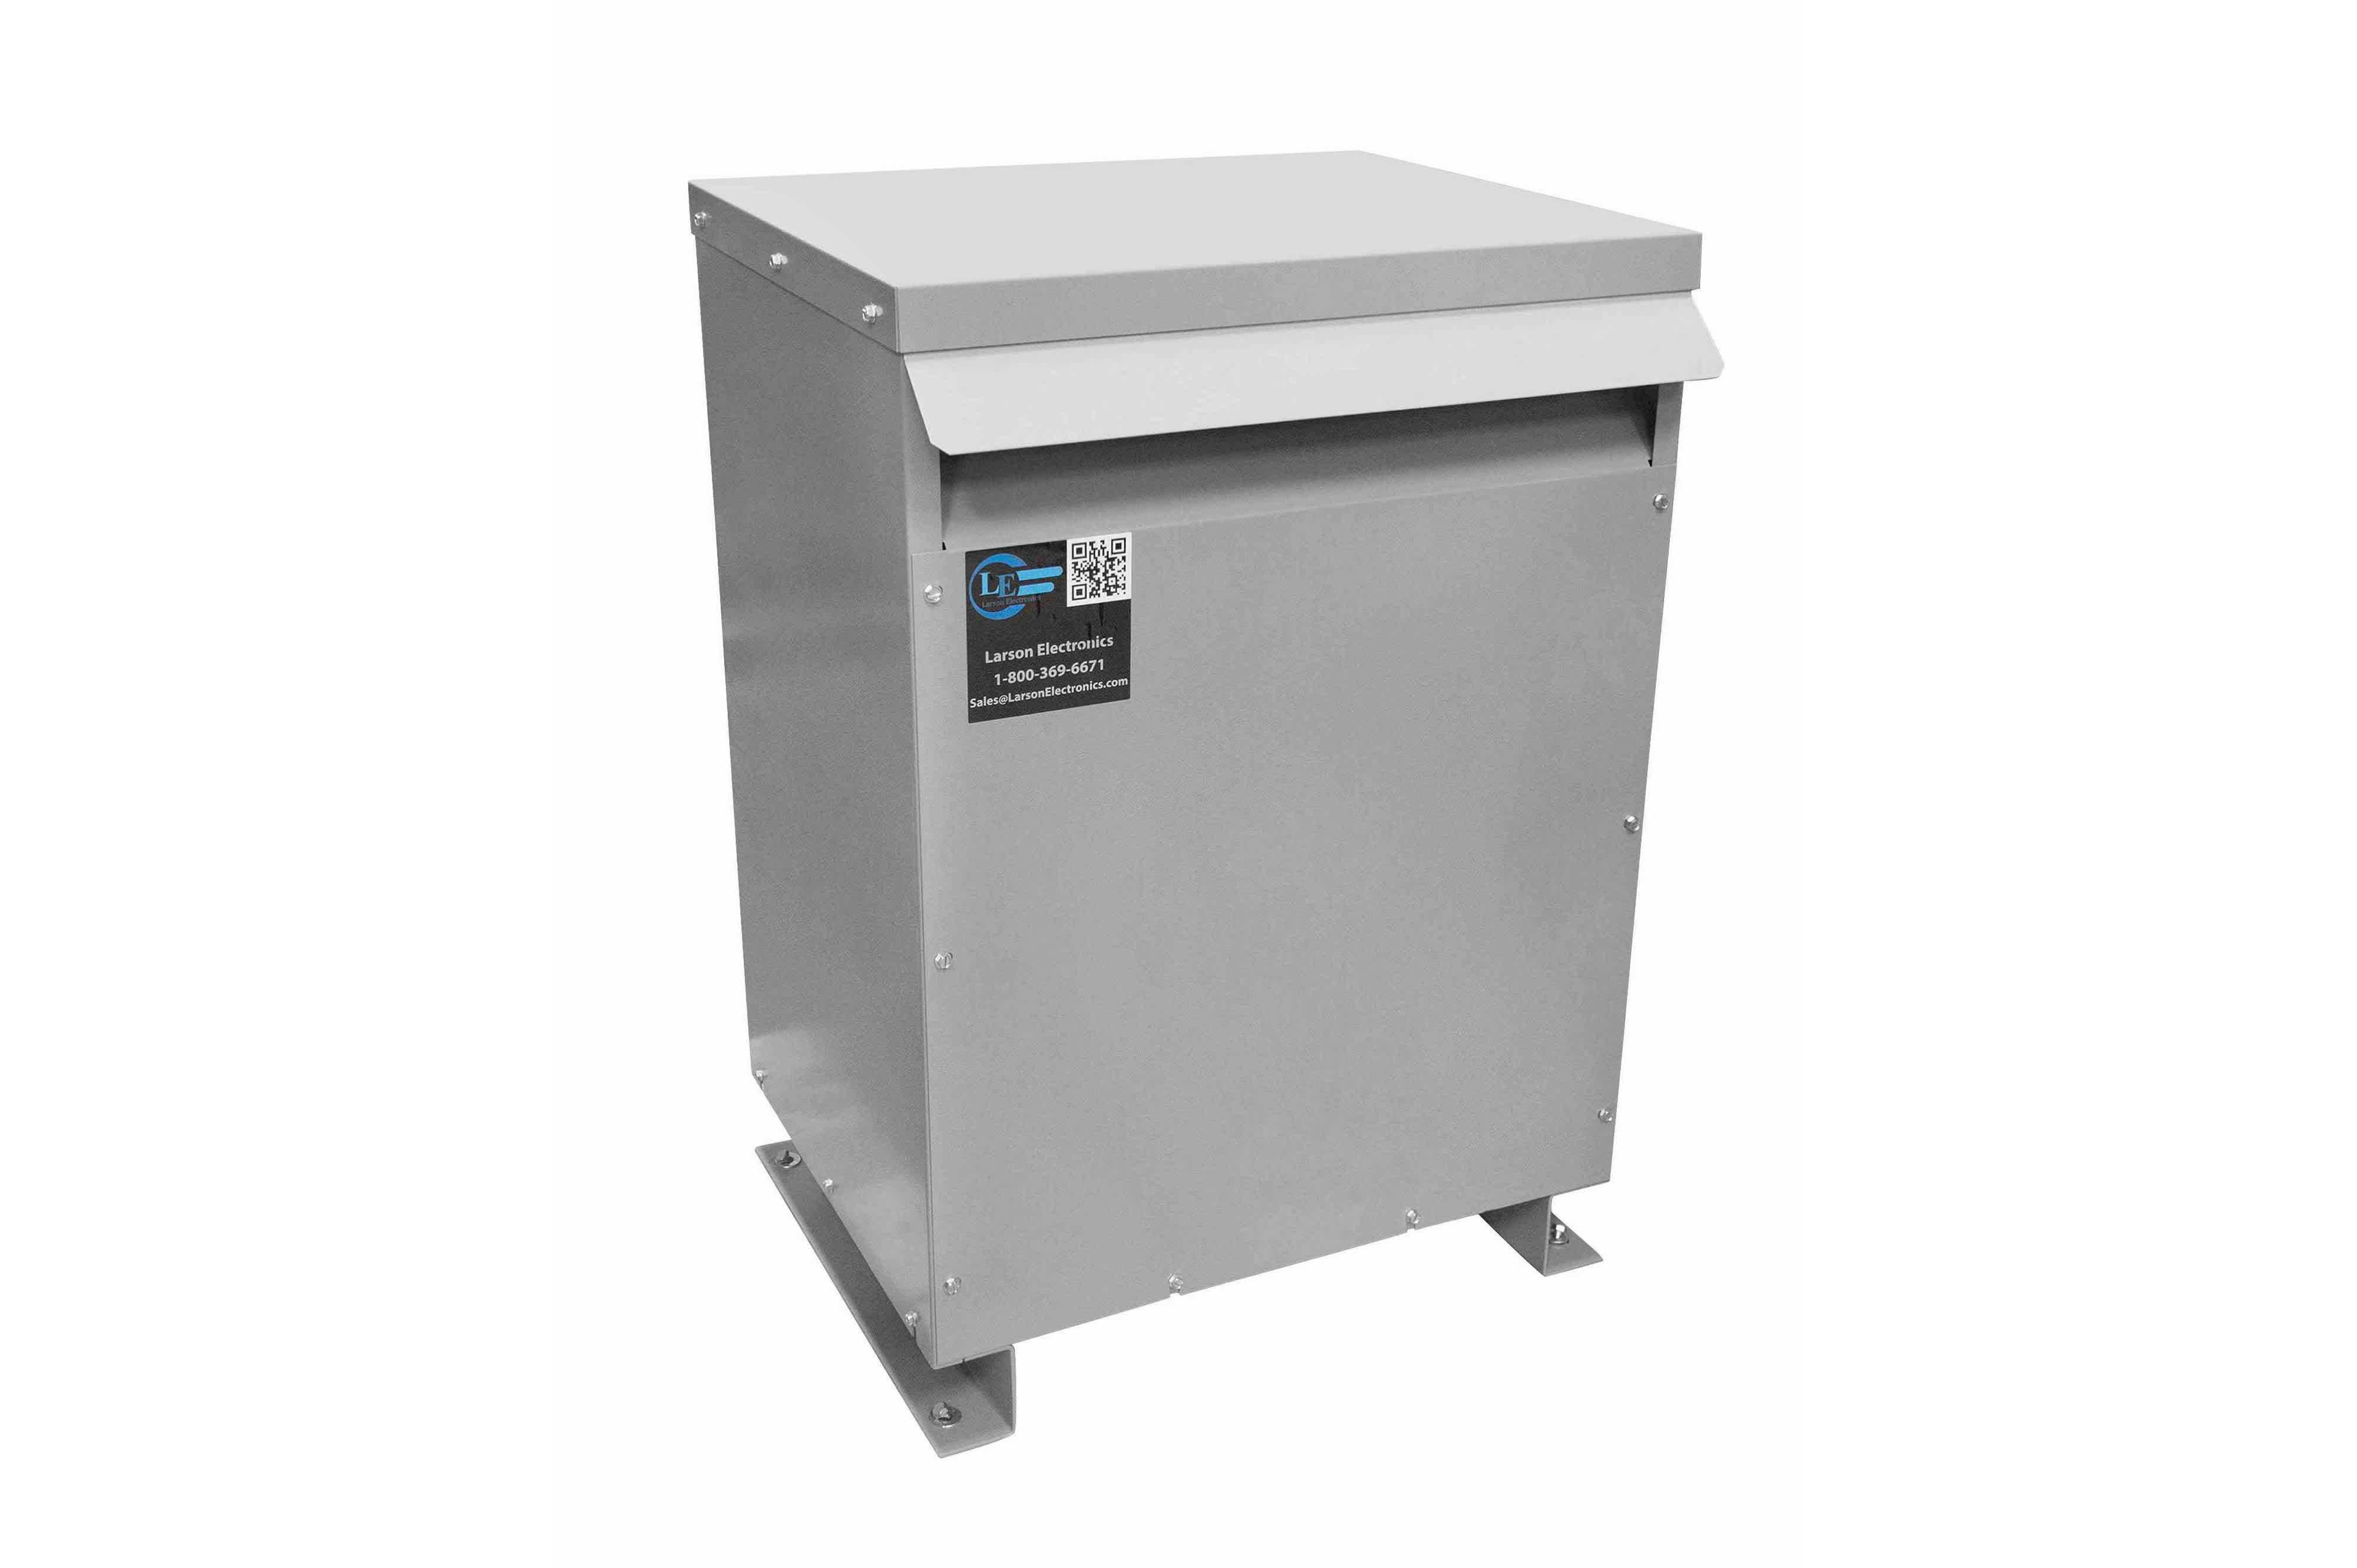 52.5 kVA 3PH Isolation Transformer, 460V Wye Primary, 240V Delta Secondary, N3R, Ventilated, 60 Hz